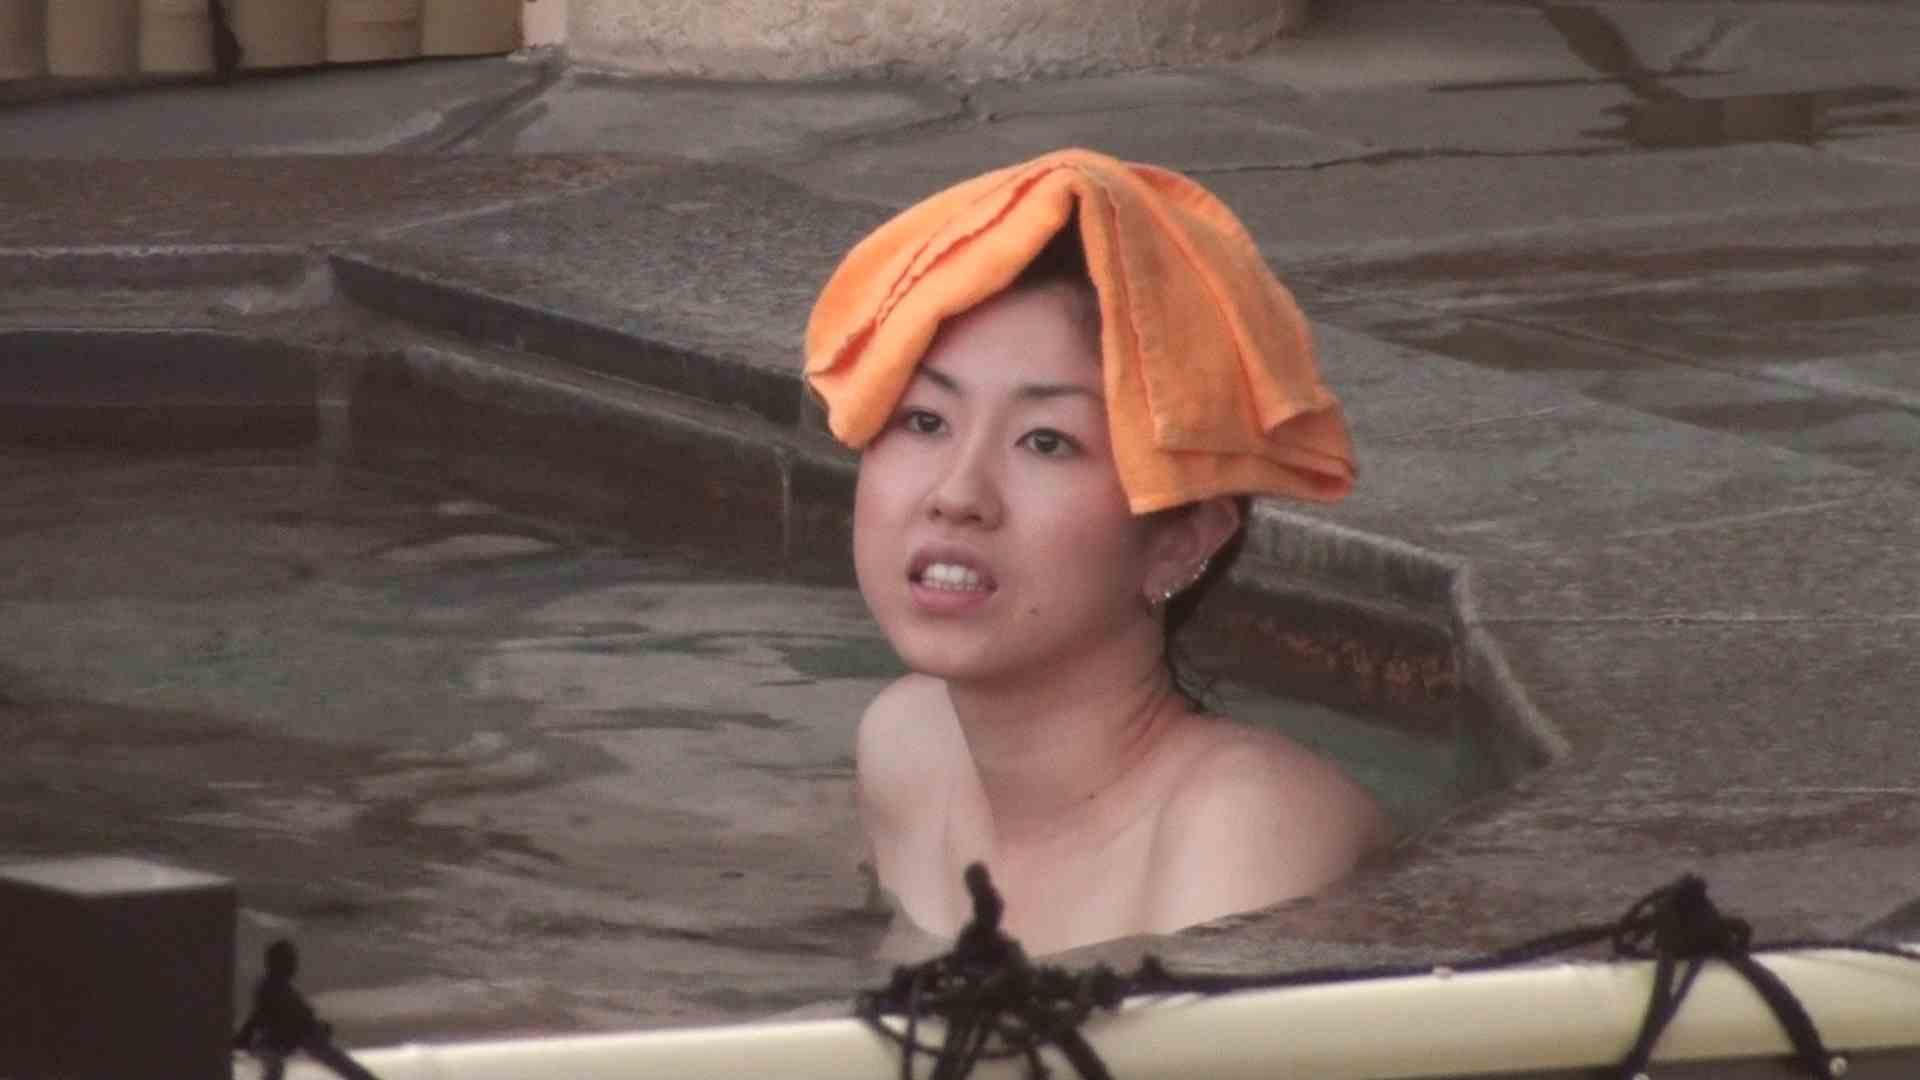 Aquaな露天風呂Vol.135 露天 AV無料動画キャプチャ 67連発 15